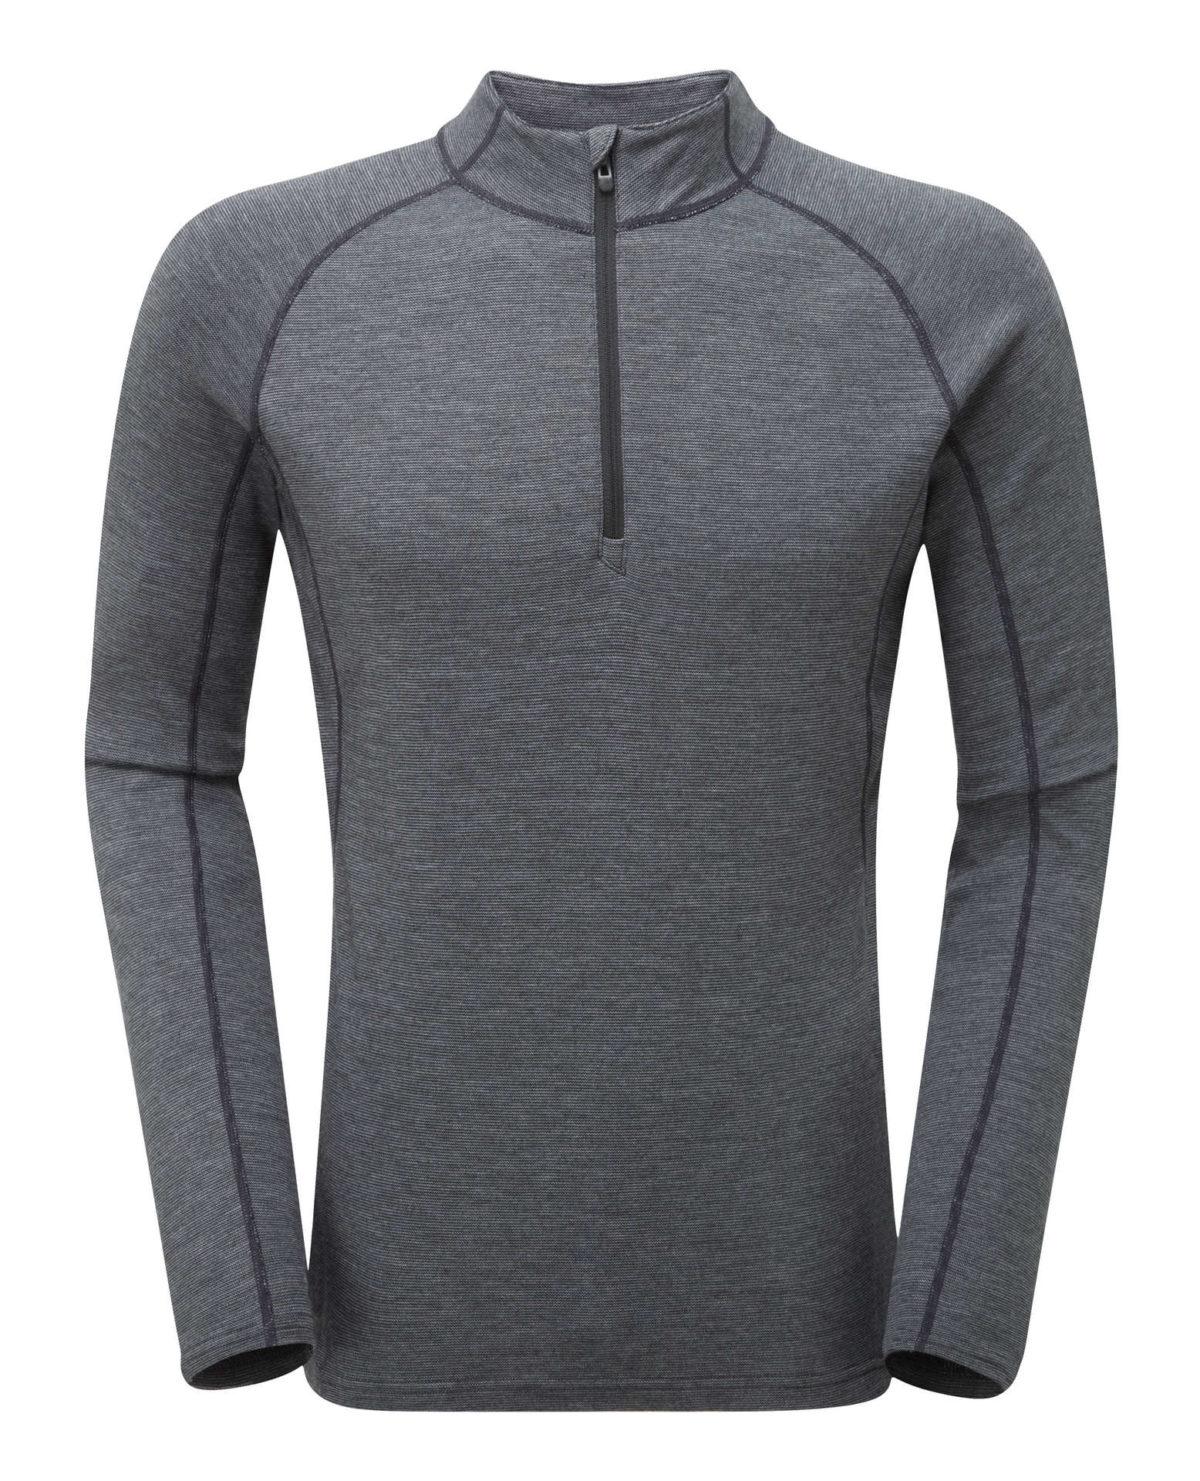 Motnae Primino mirino wool and Primaloft mix long sleeved top with zip neck